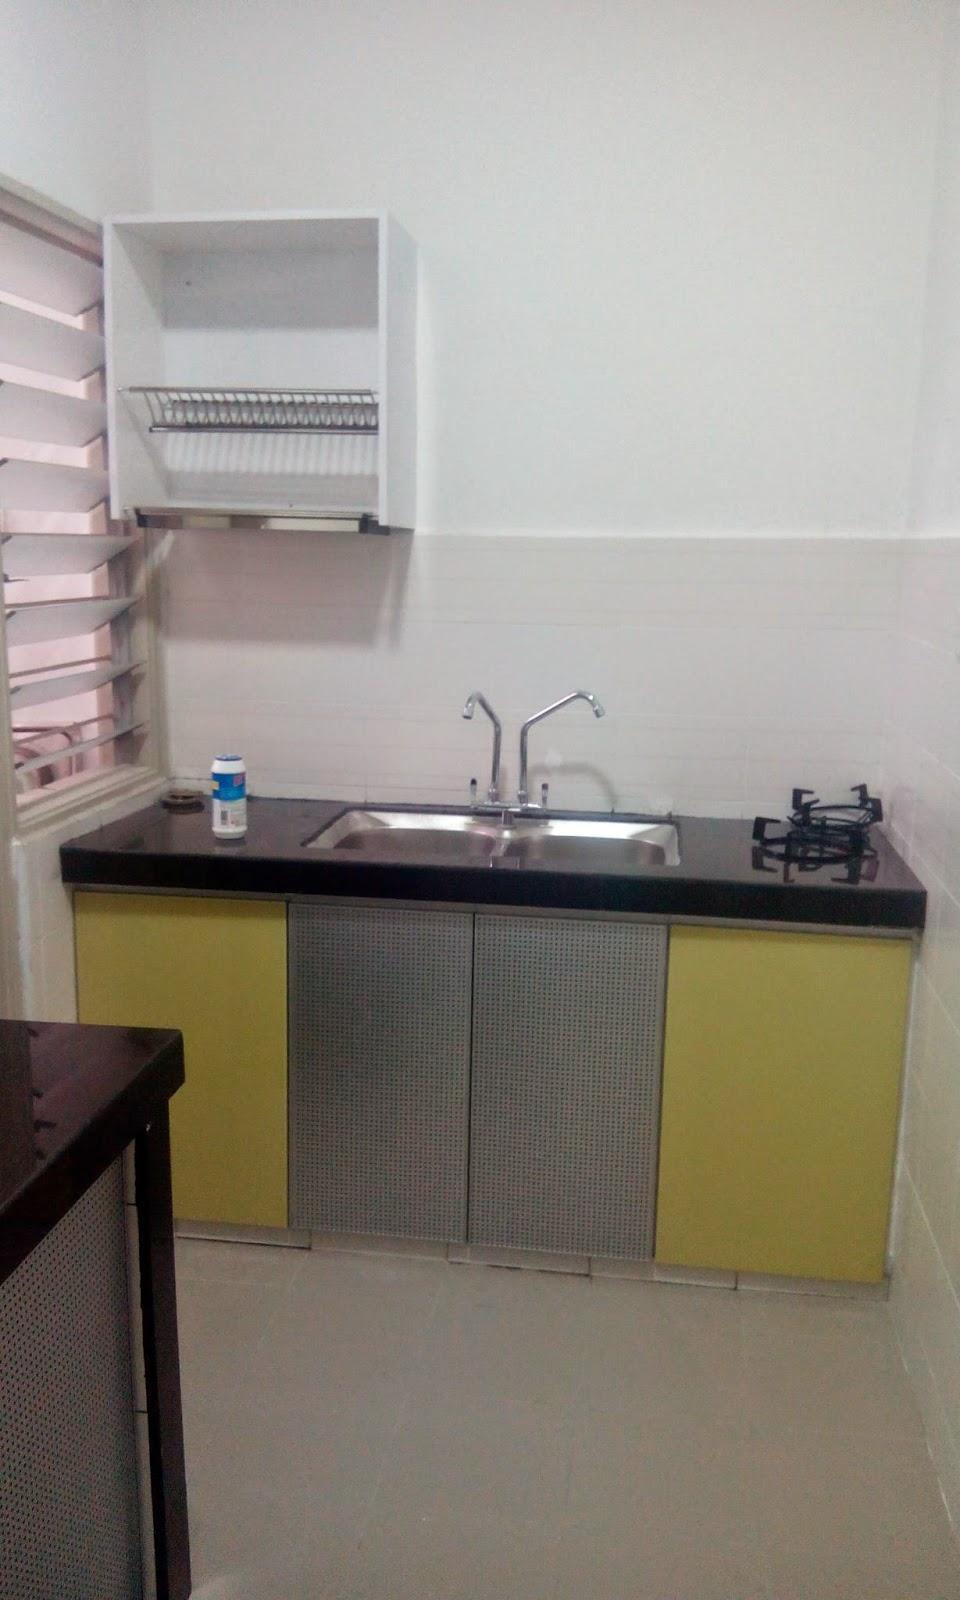 Simple Je Kabinet Dapur Rumah En Rizal Ni Tp Memang Cantik Walau Pun Tgk Saje Pada Pemilihan Kaler Kombinasi Hitam Dan Kuning Terdapat Juga Pintu